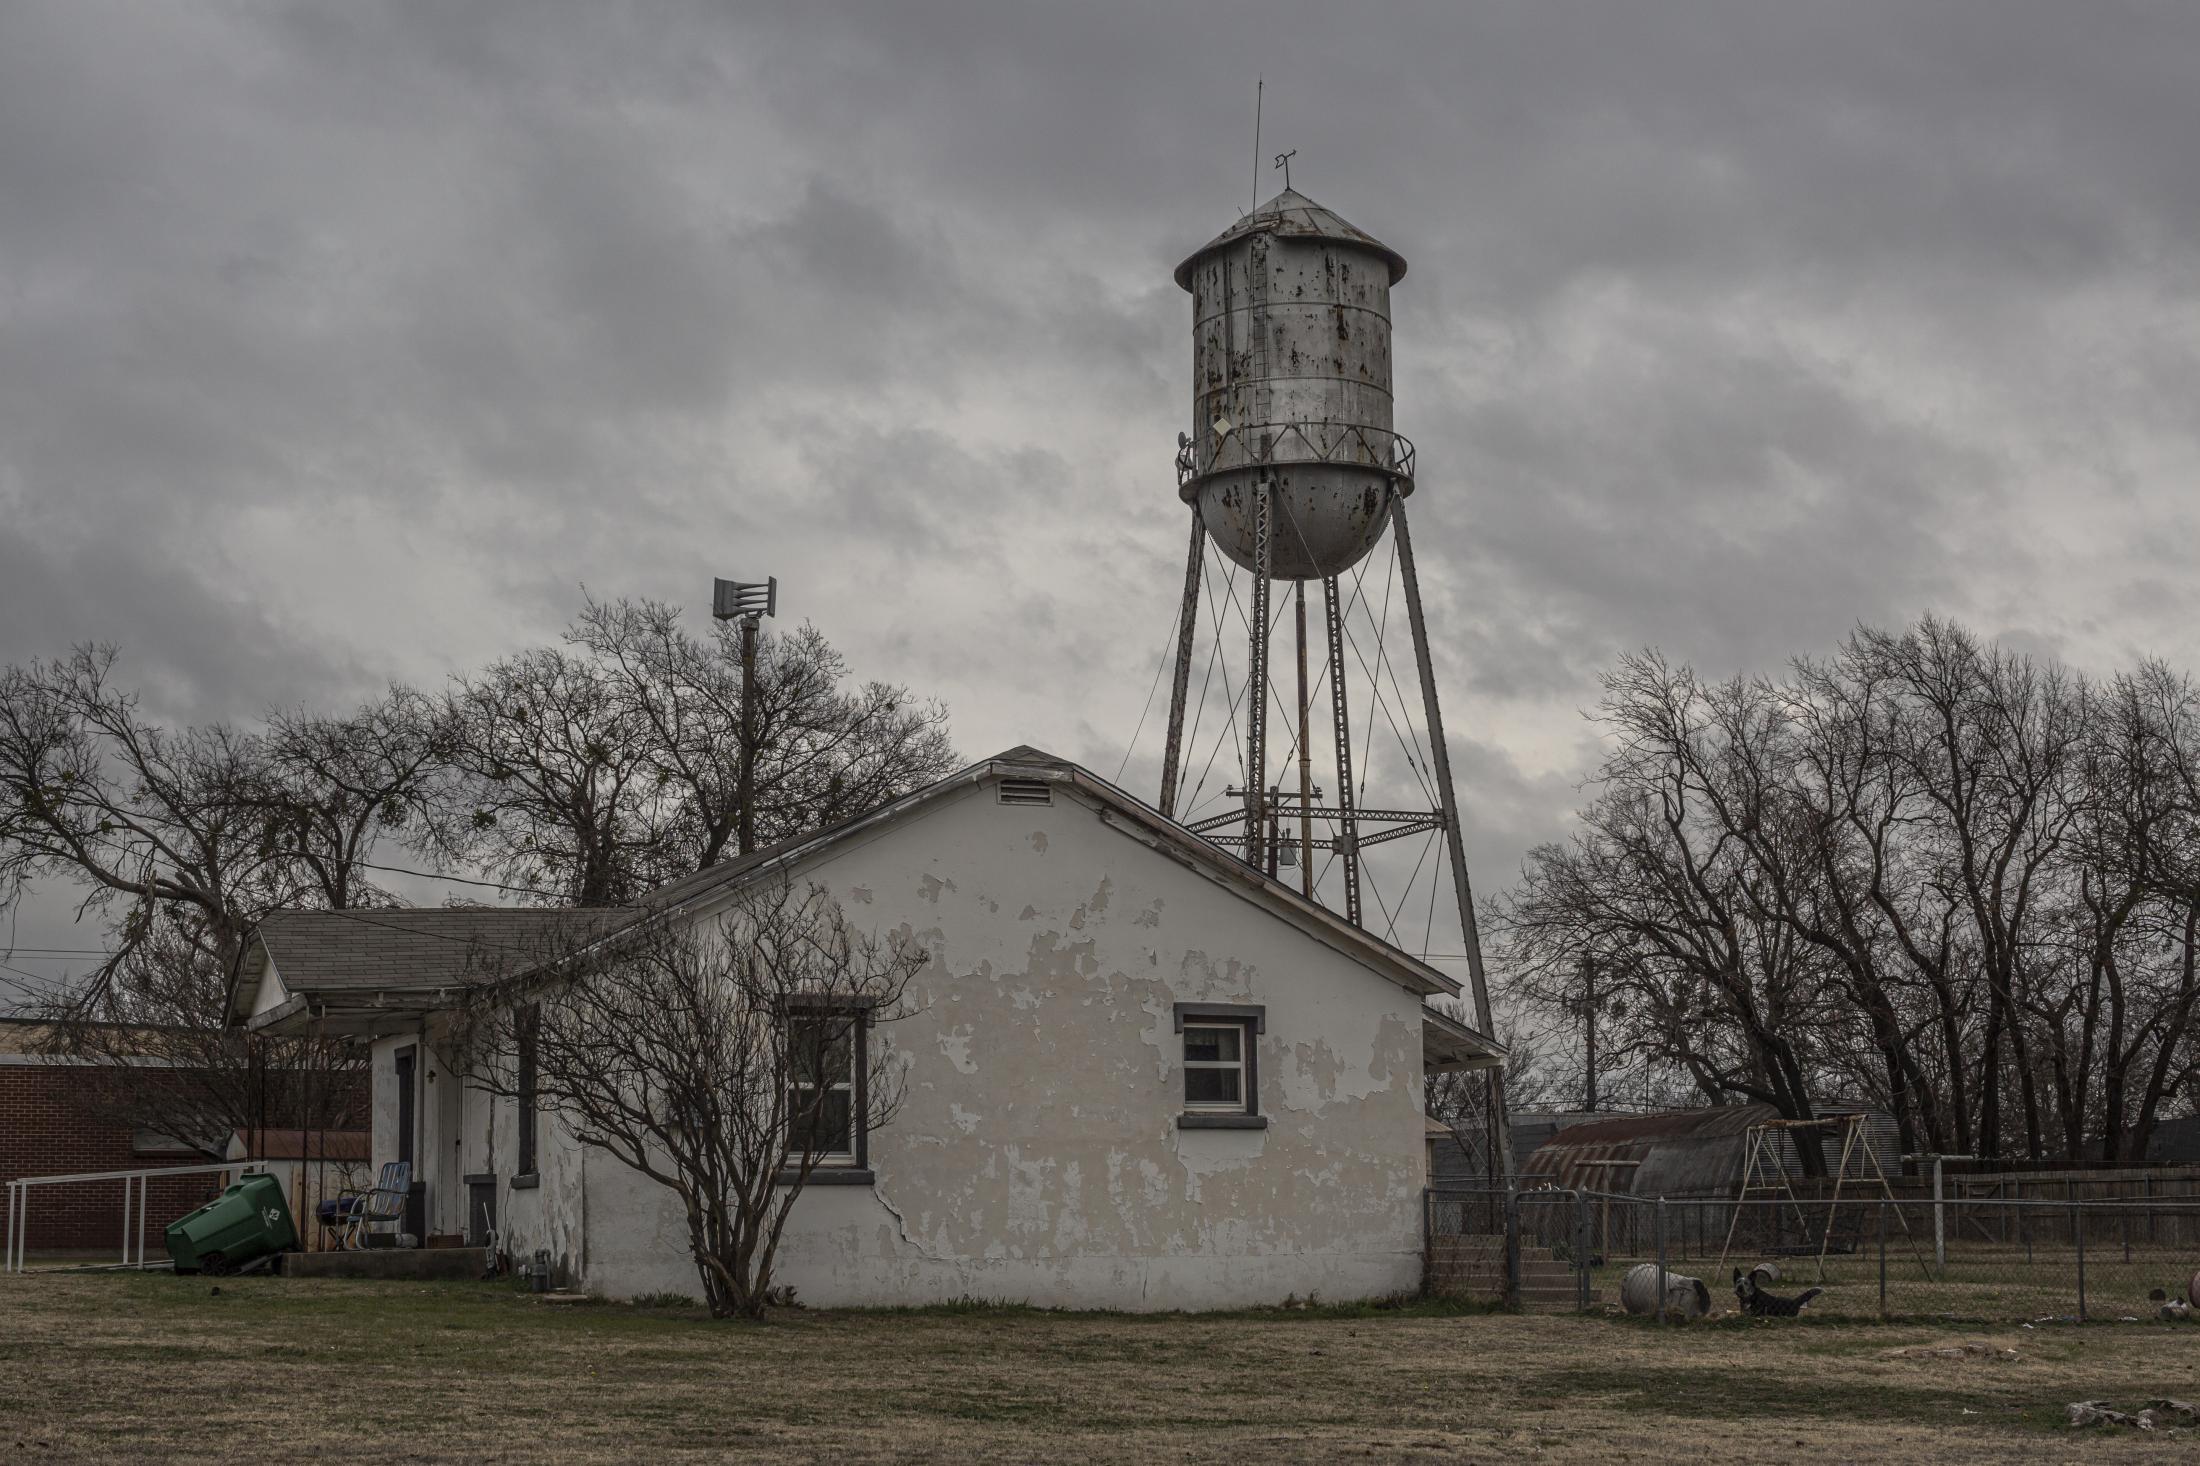 Rhome, Texas #2